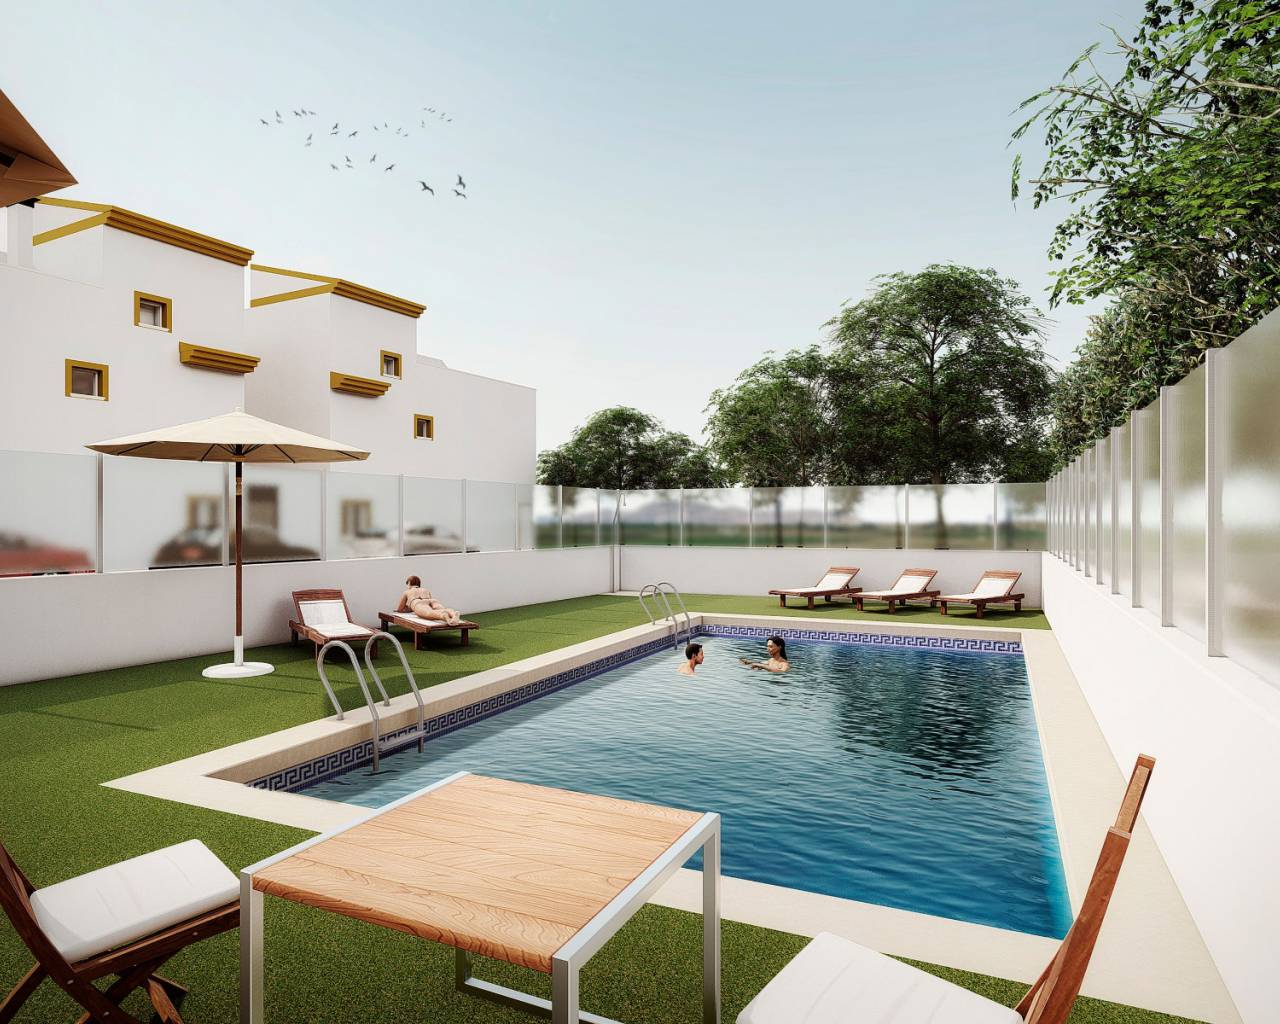 nieuwbouw-geschakelde-woning-duplex-torre-pacheco-santa-rosalia_4602_xl